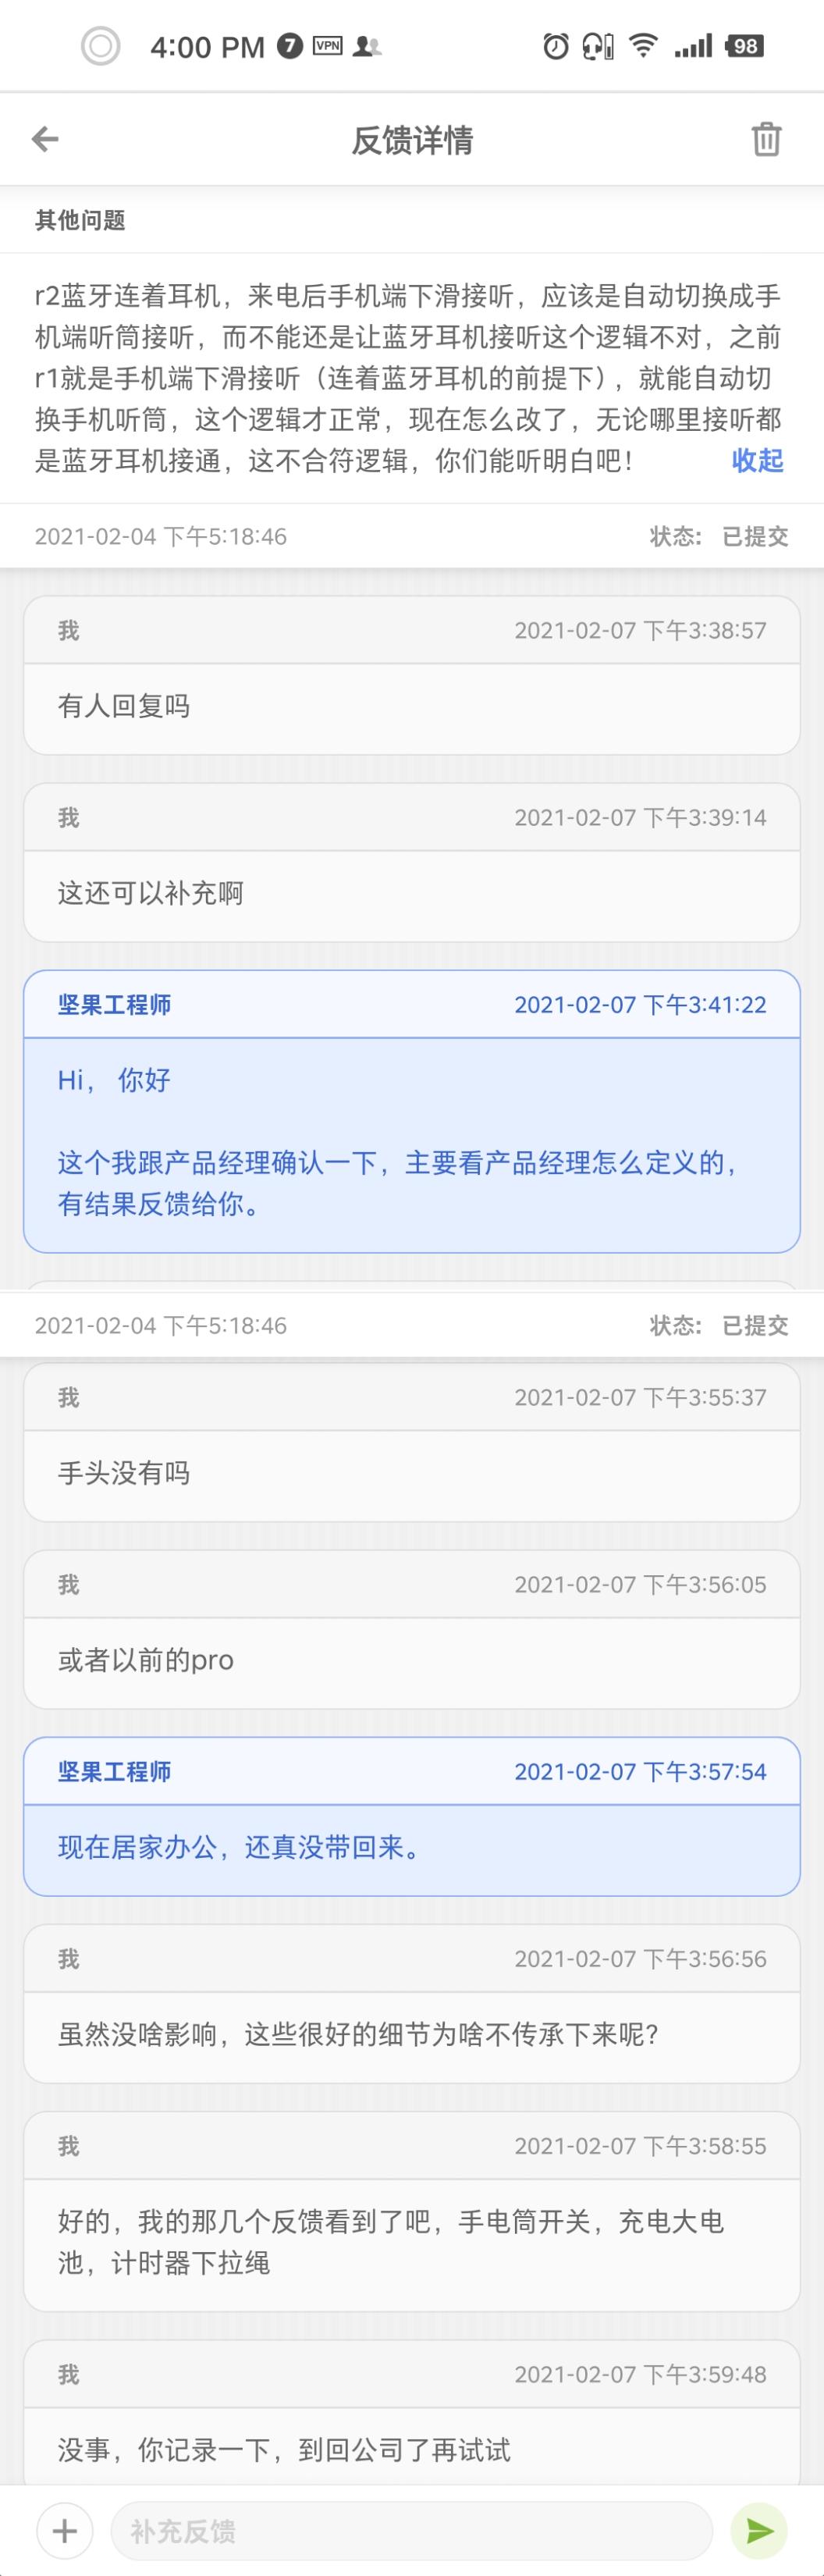 Screenshot_2021-02-07-16-00-43-010_????.png